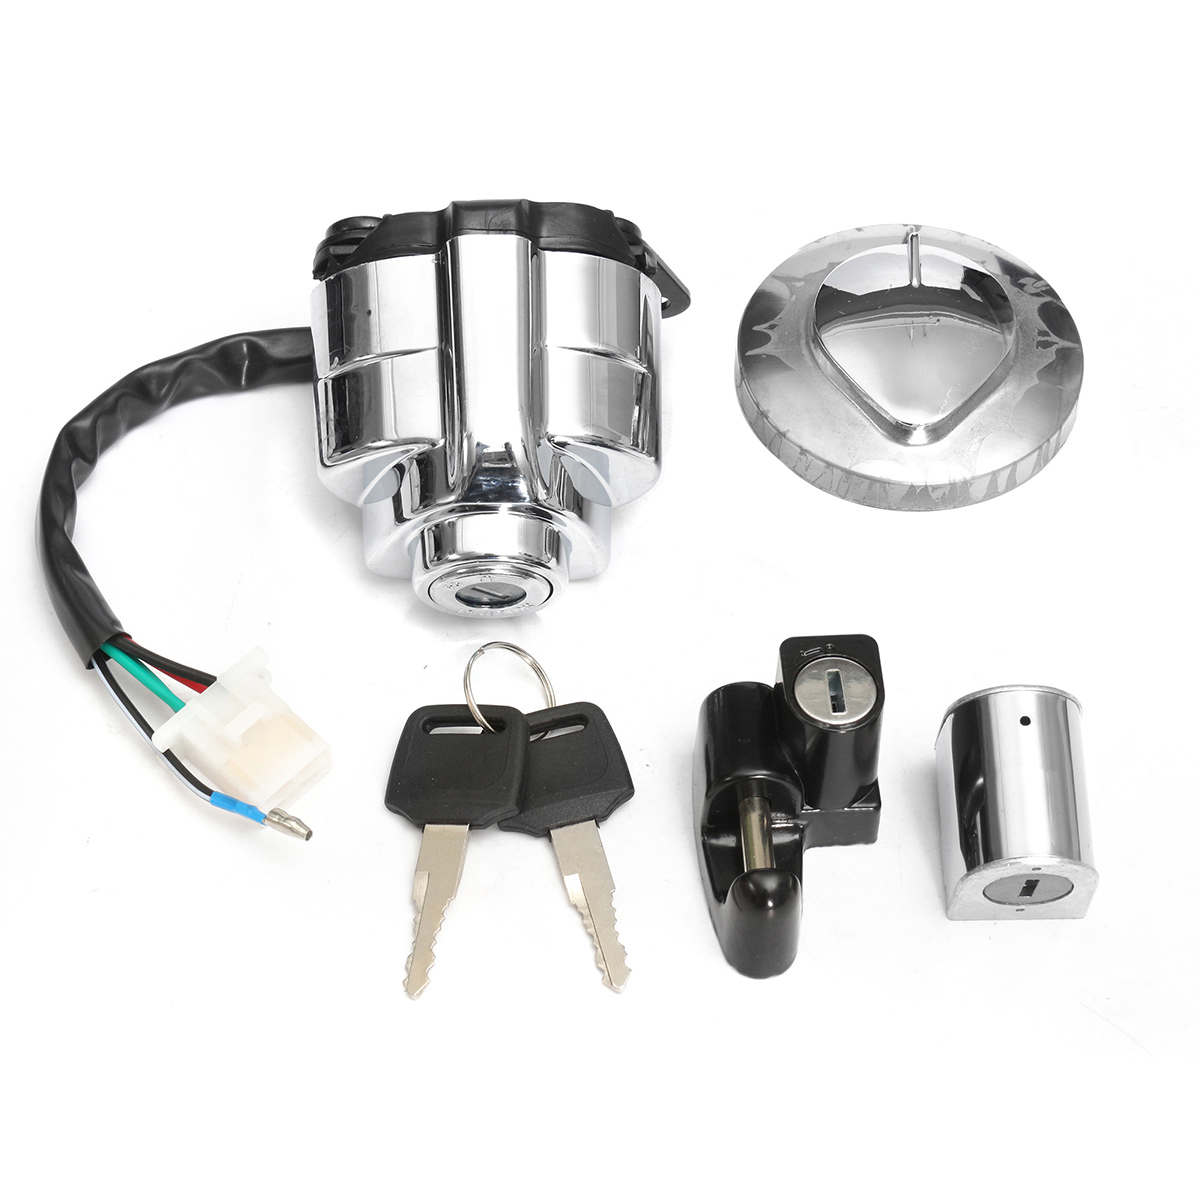 1 Set Aluminium Zündung Gas Kappe Helm Lenkung Lock Set für Honda Shadow VLX VT 400 600 750